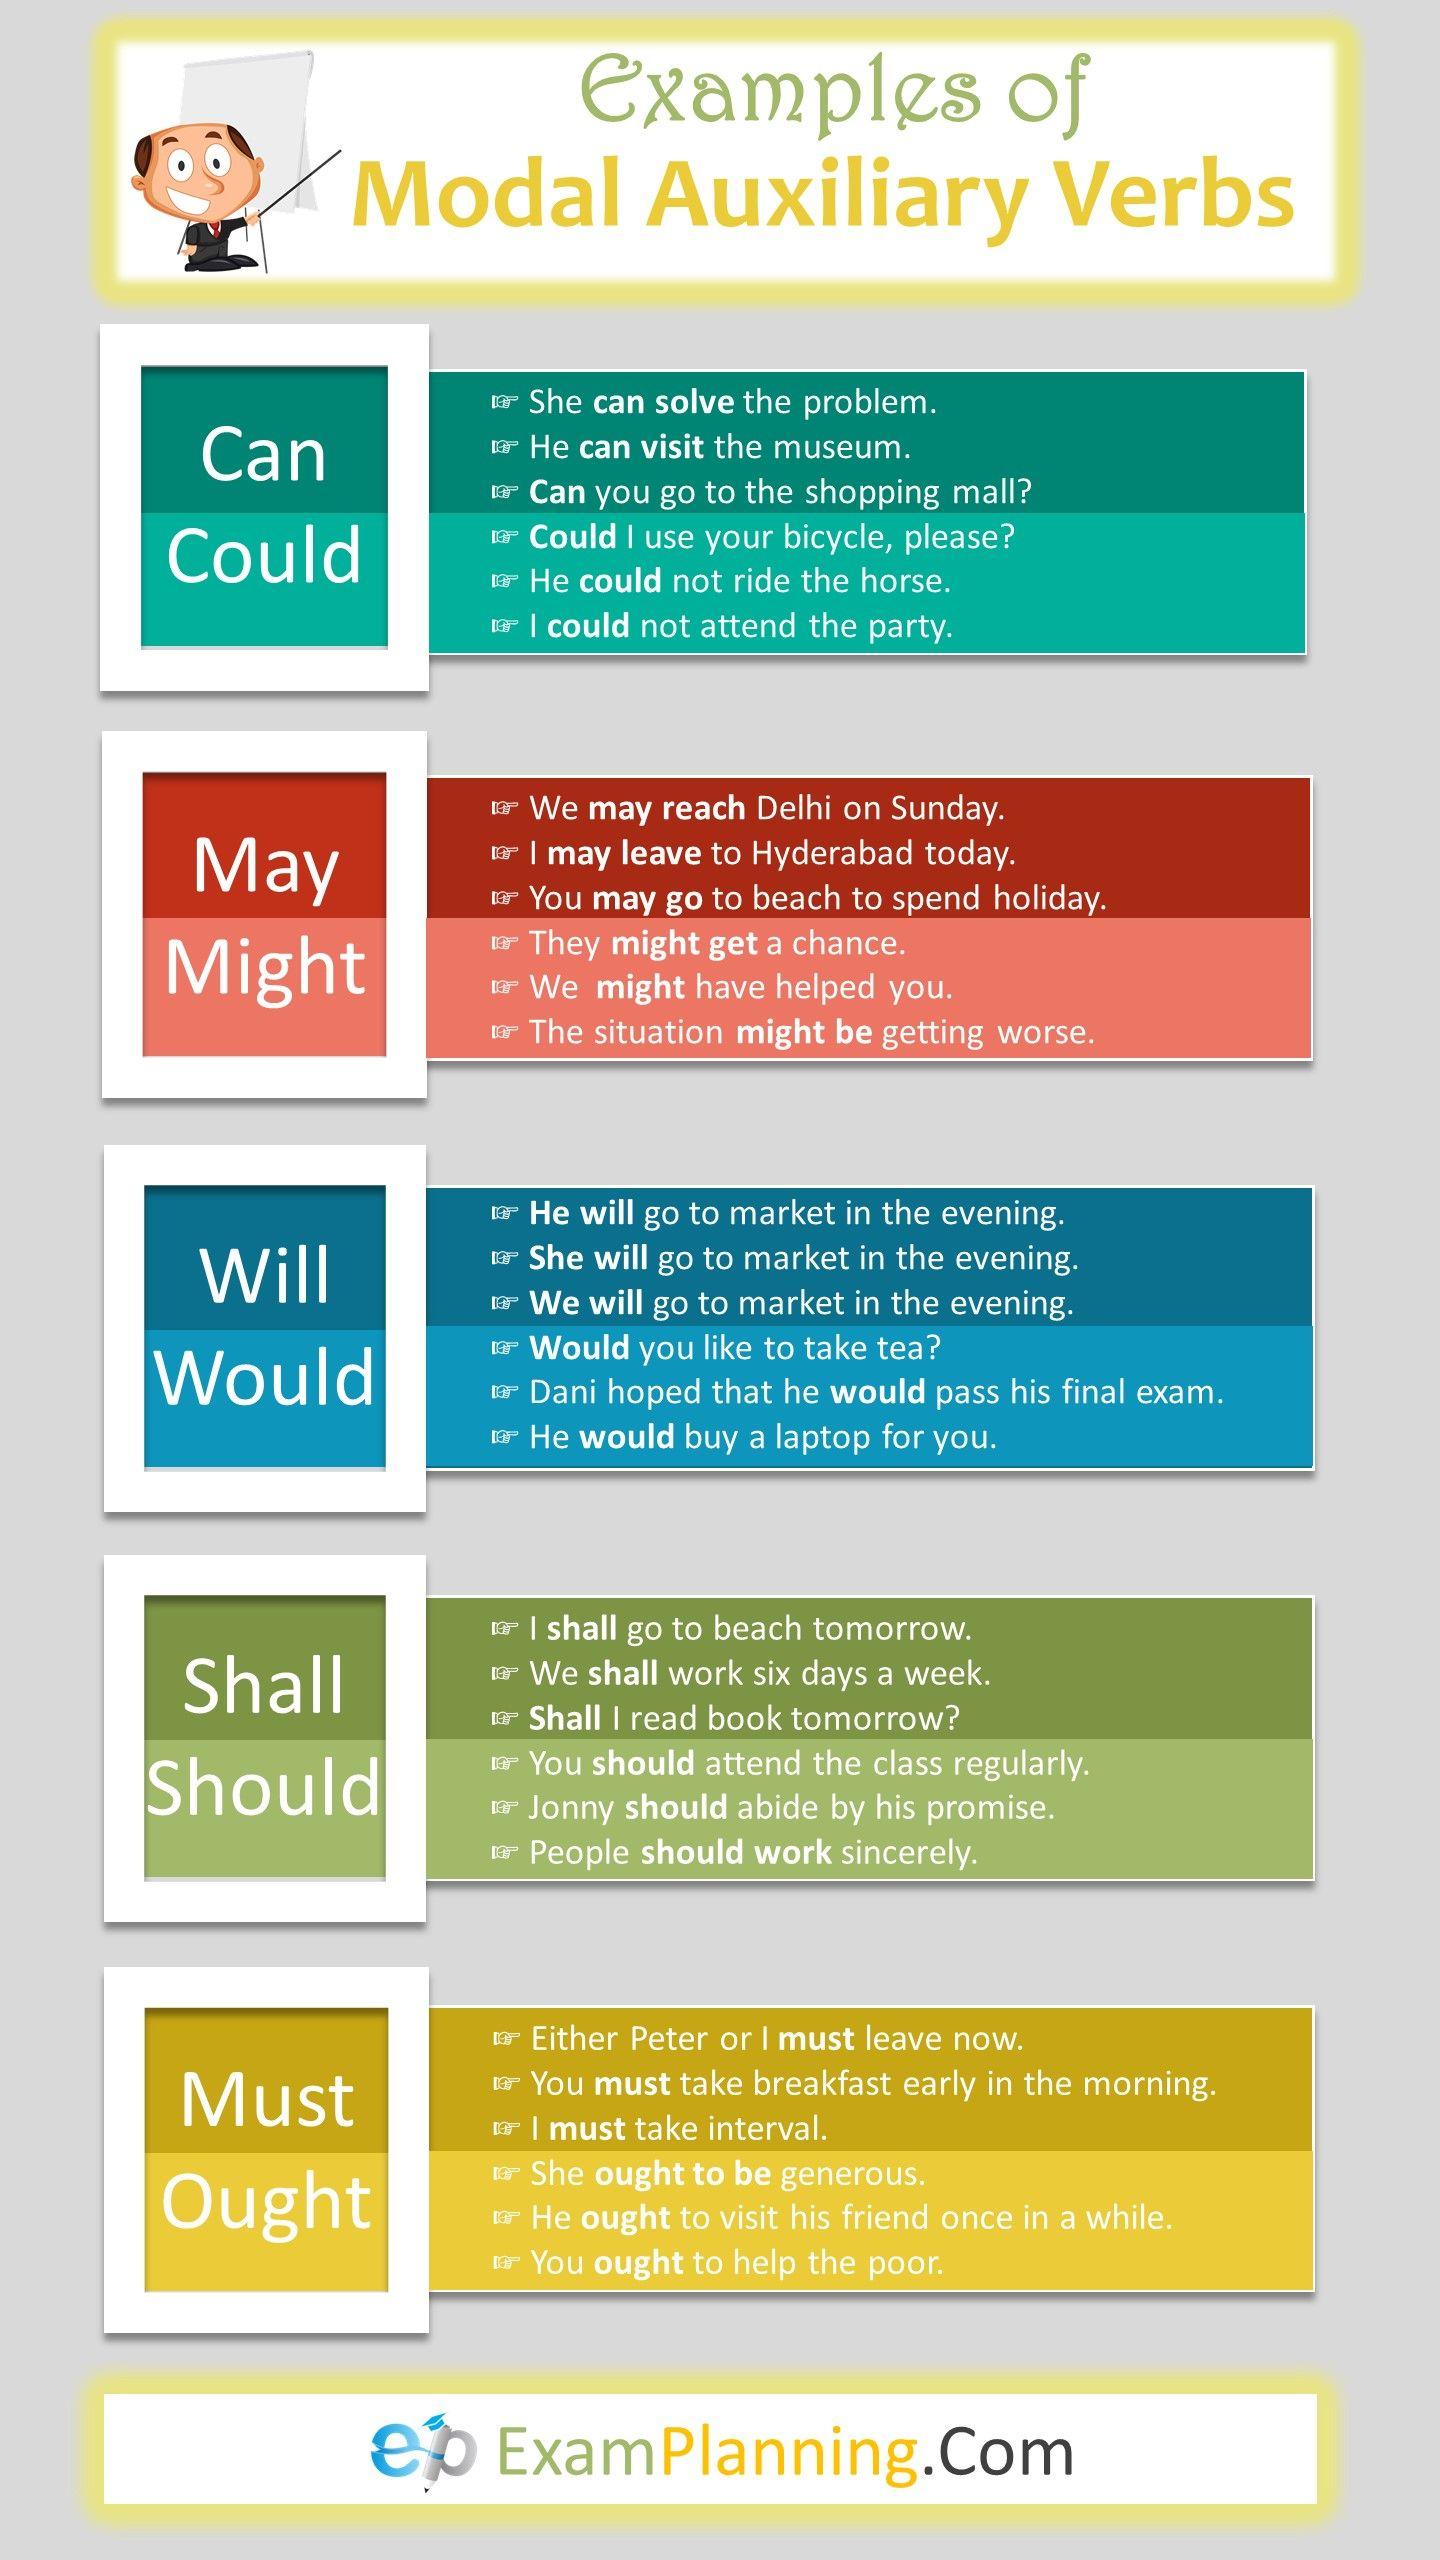 33 Examples Of Modal Auxiliary Verbs English Grammar English Verbs English Language Teaching [ 2560 x 1440 Pixel ]